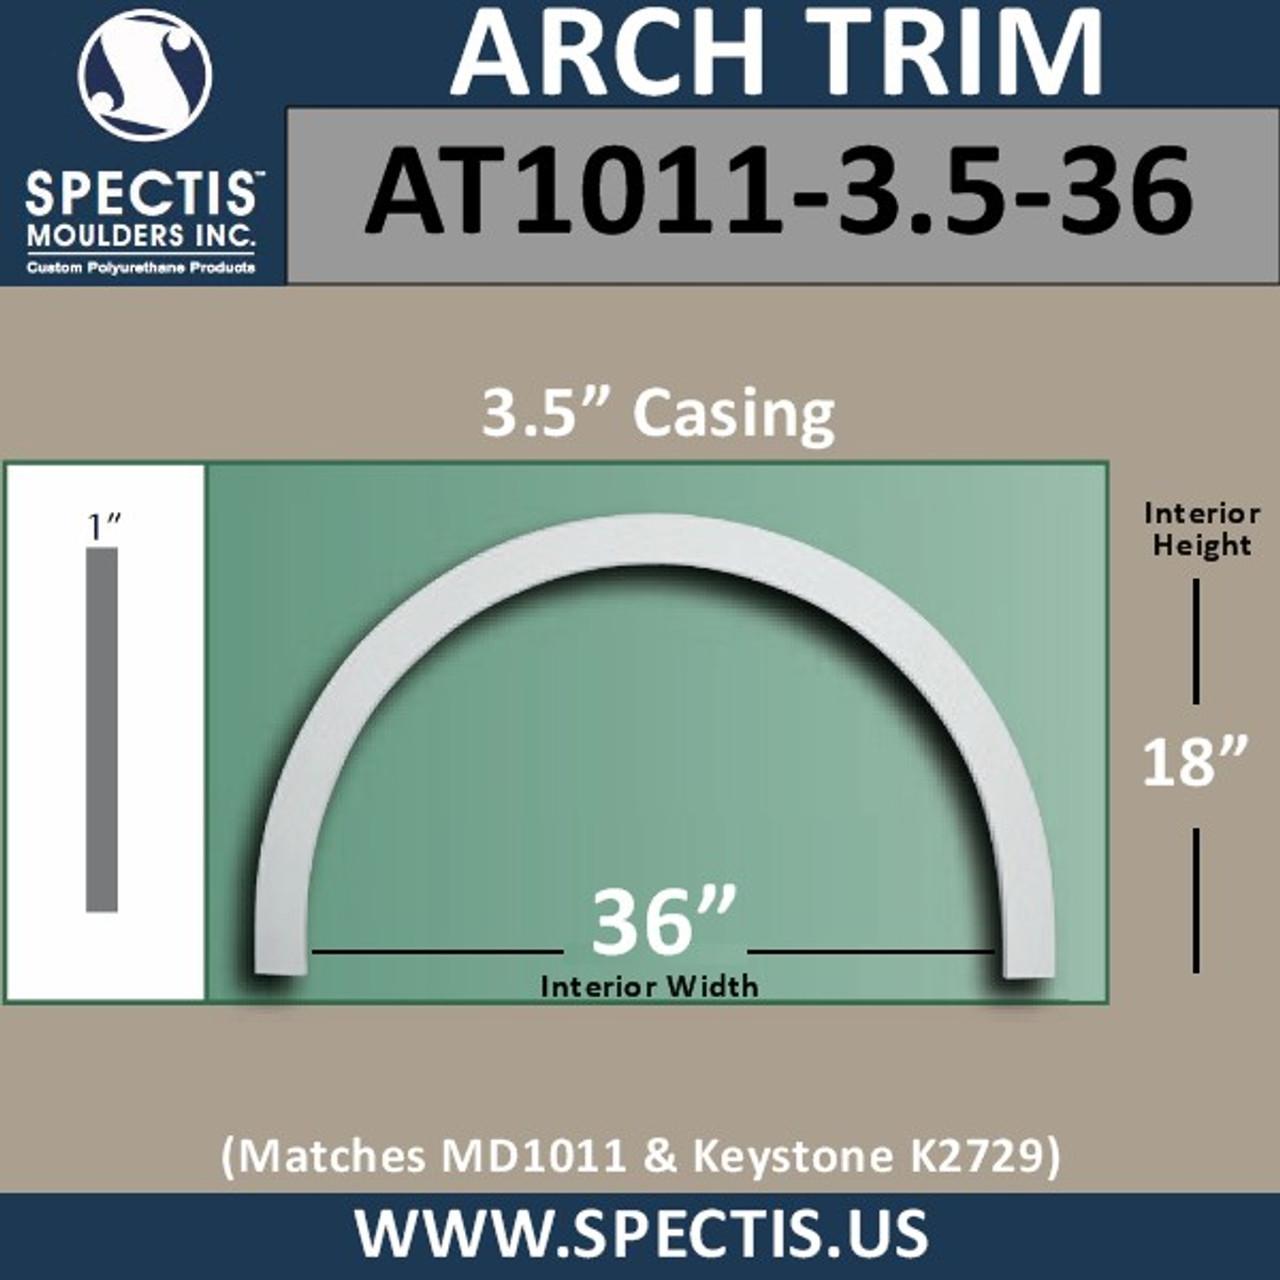 "AT1011-3.5-36 Flat Trim Urethane Door or Window Arch 36"" ID"